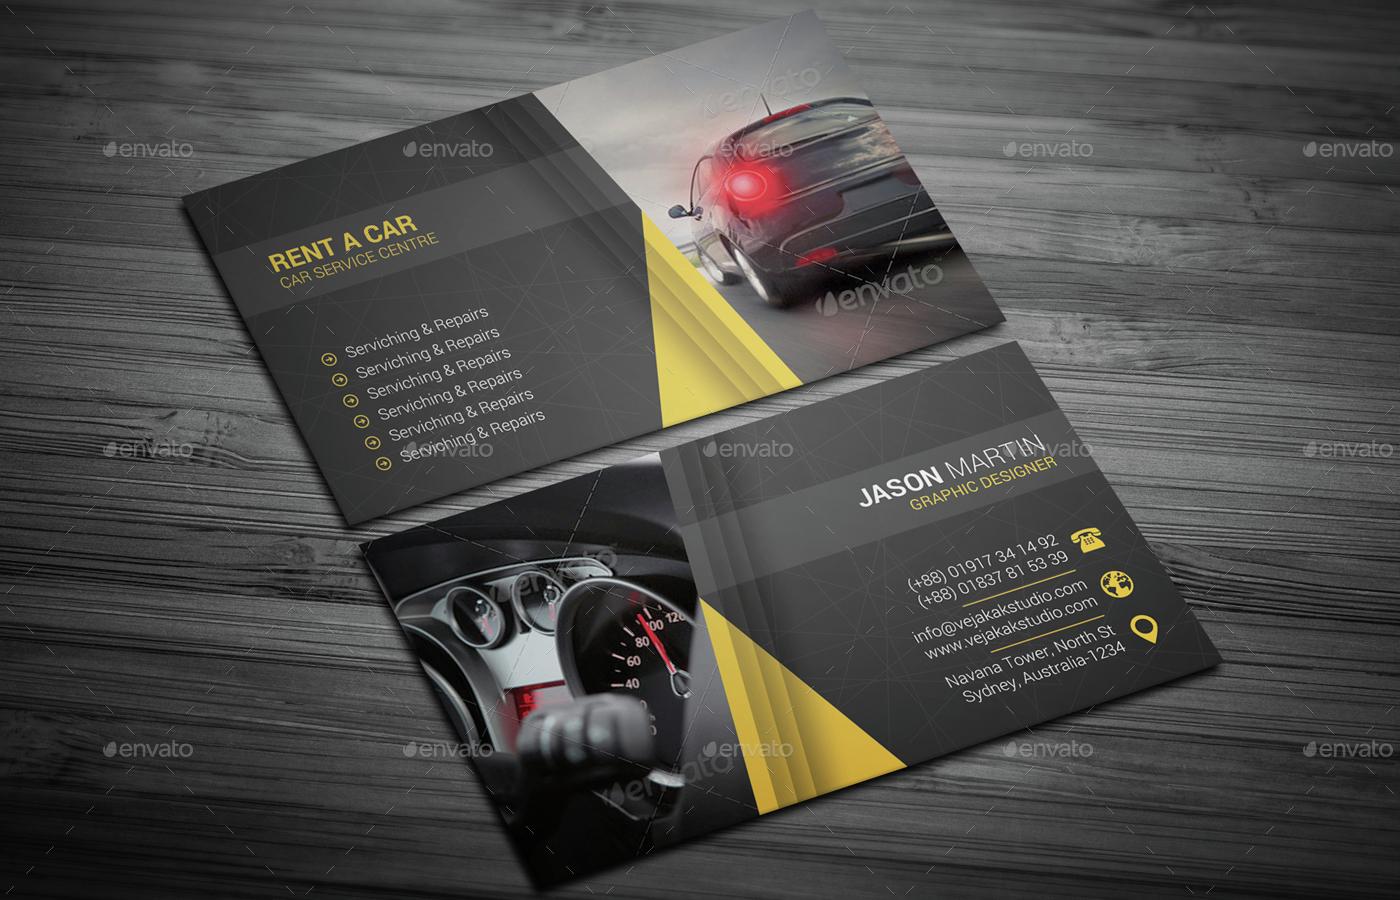 Rent A Car Business Card by vejakakstudio | GraphicRiver